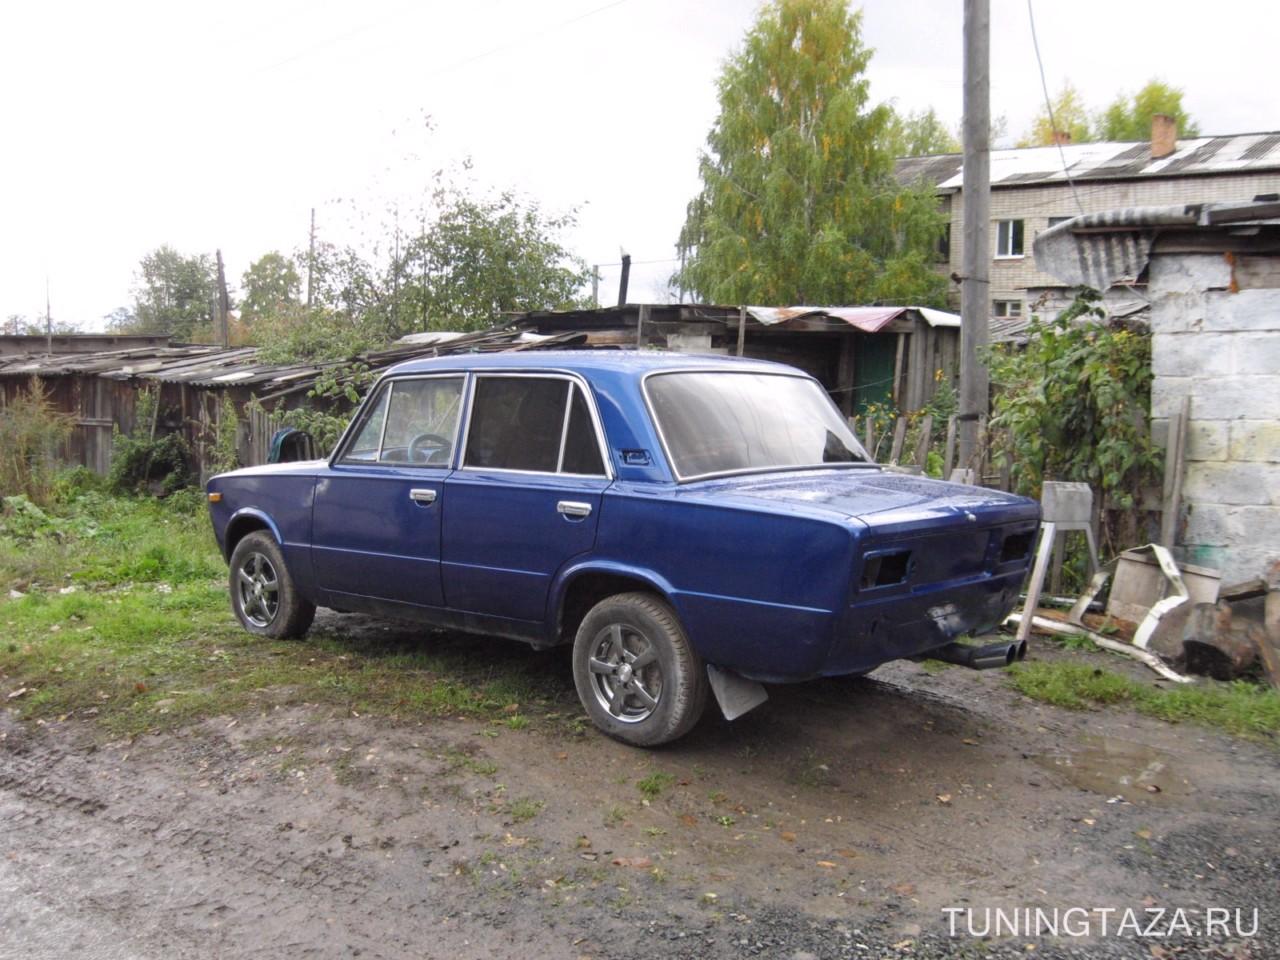 Покраска зеркала автомобиля своими руками